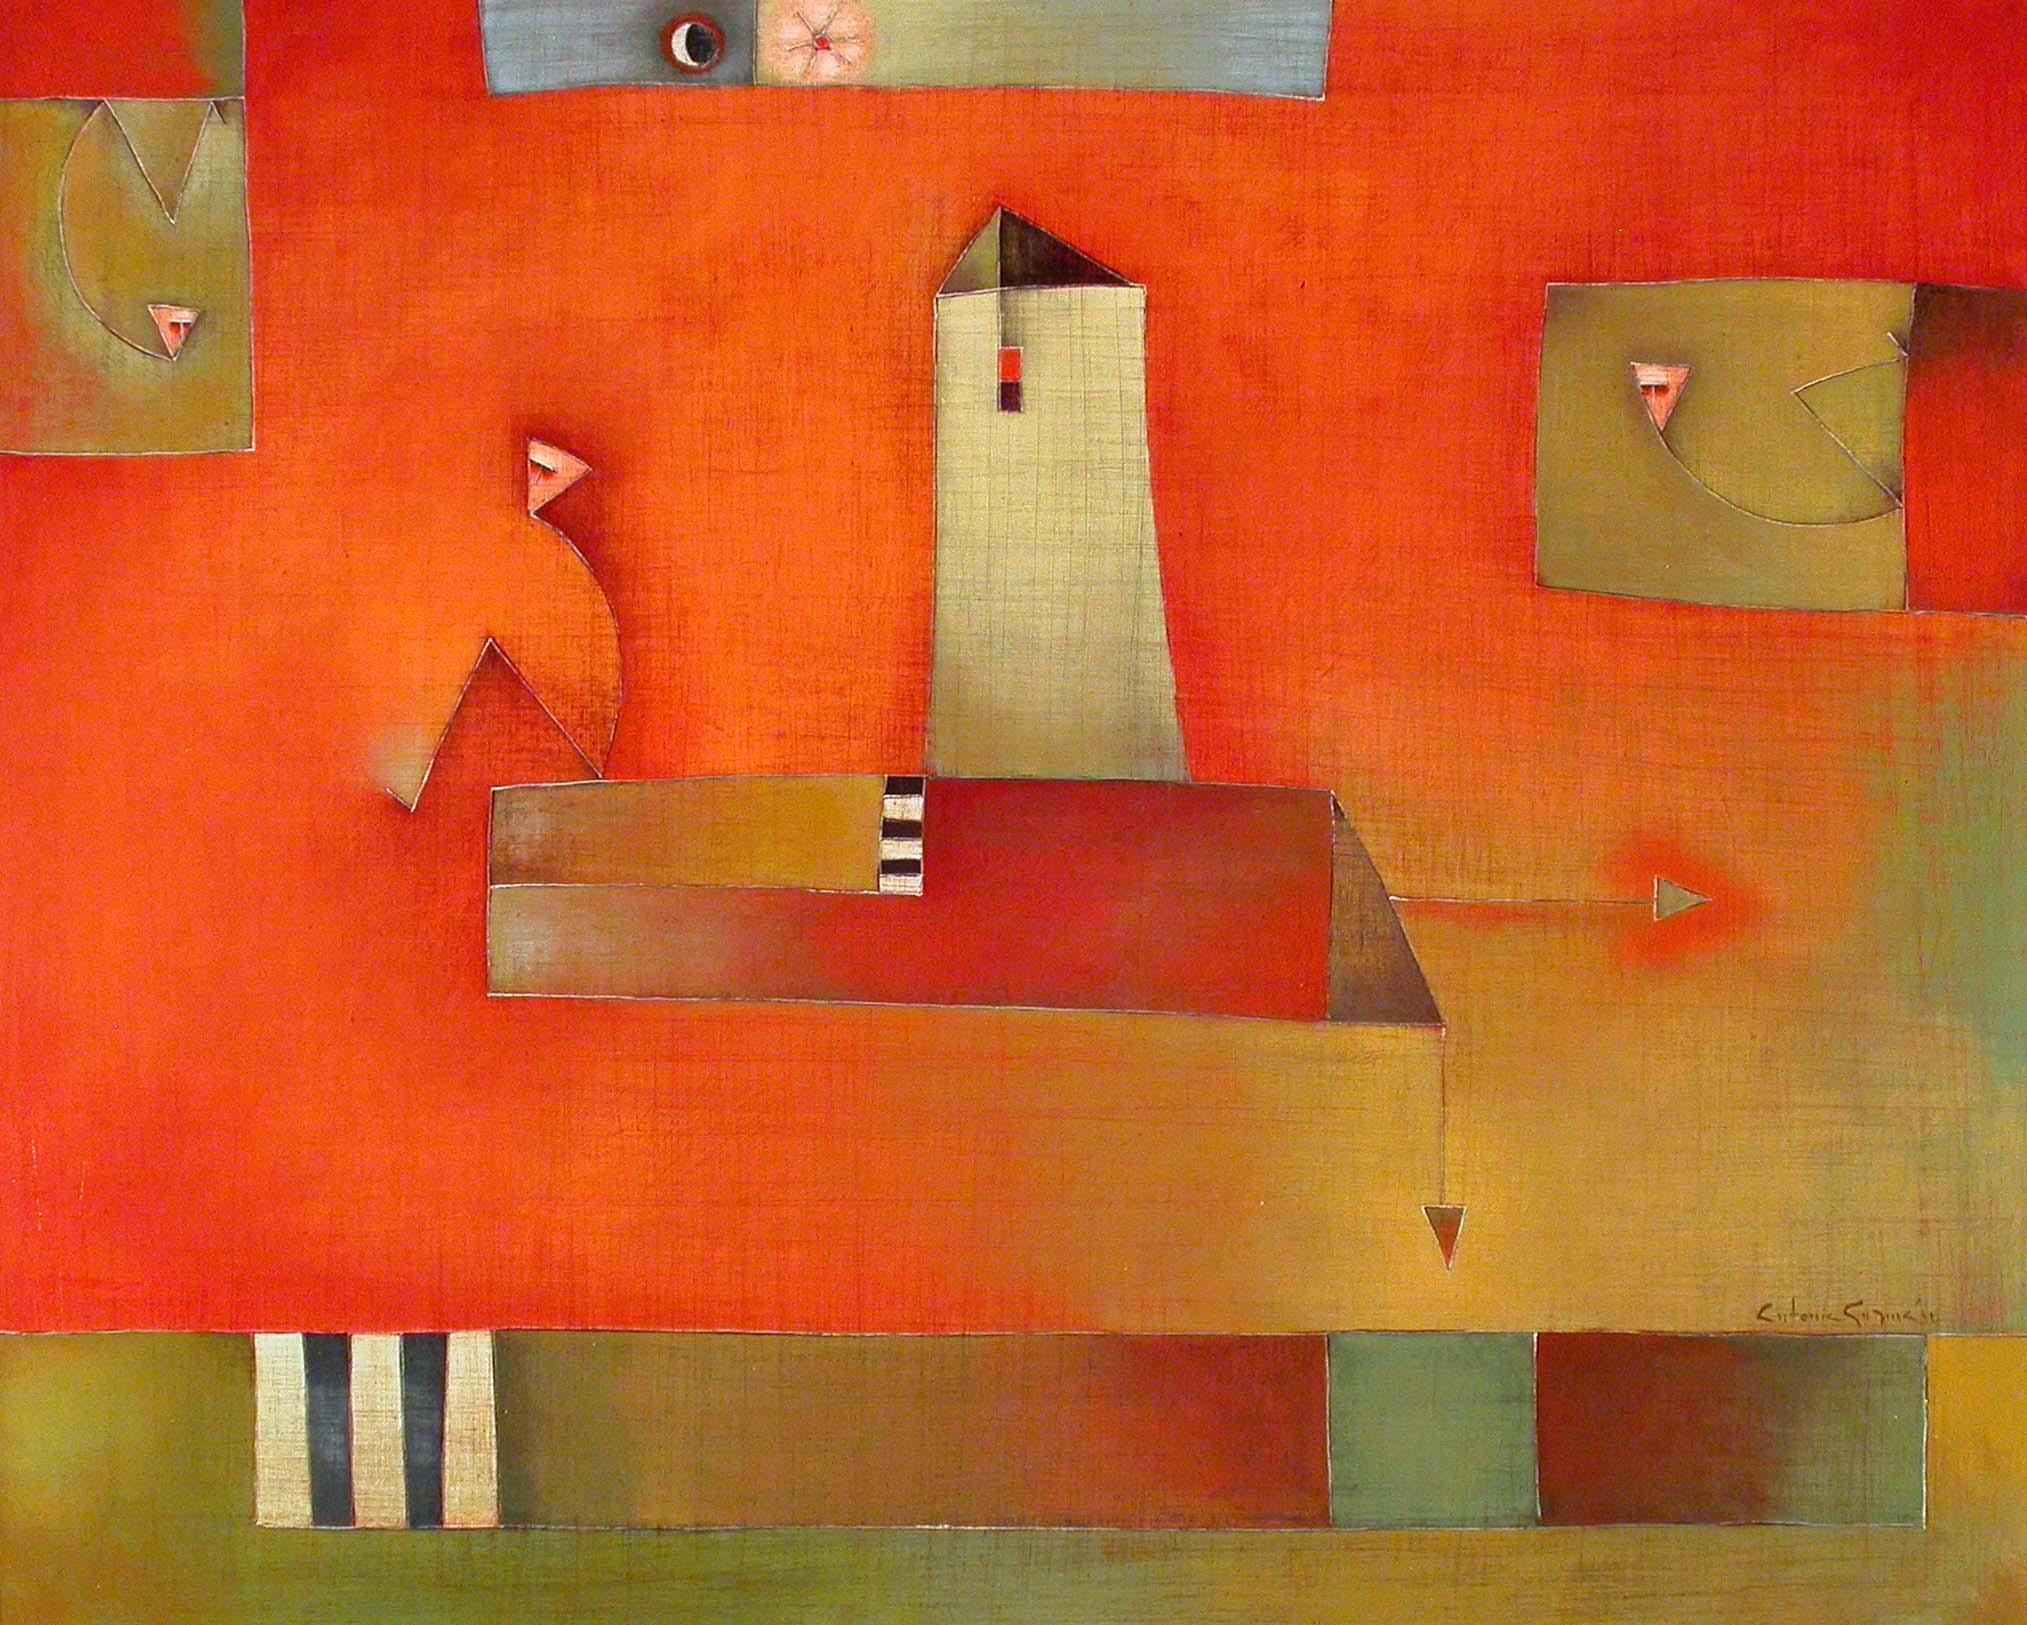 Sin Rombo Fijo, Acrylic on Canvas, 31 x 39